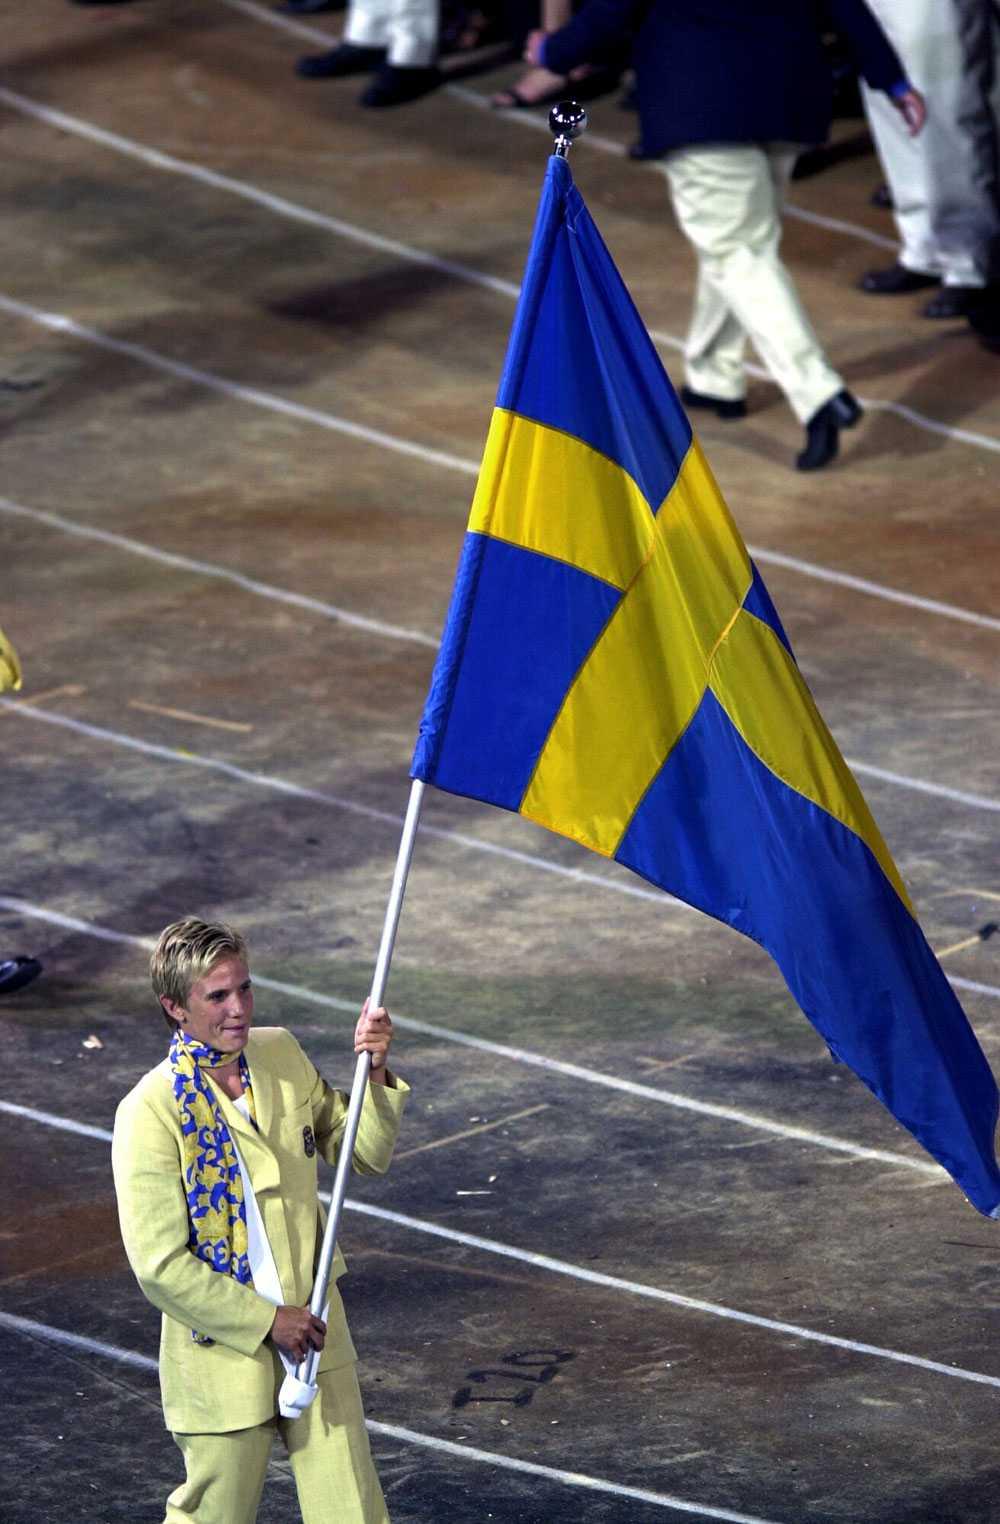 2000 i Sydney: Anna Olsson, kanot.